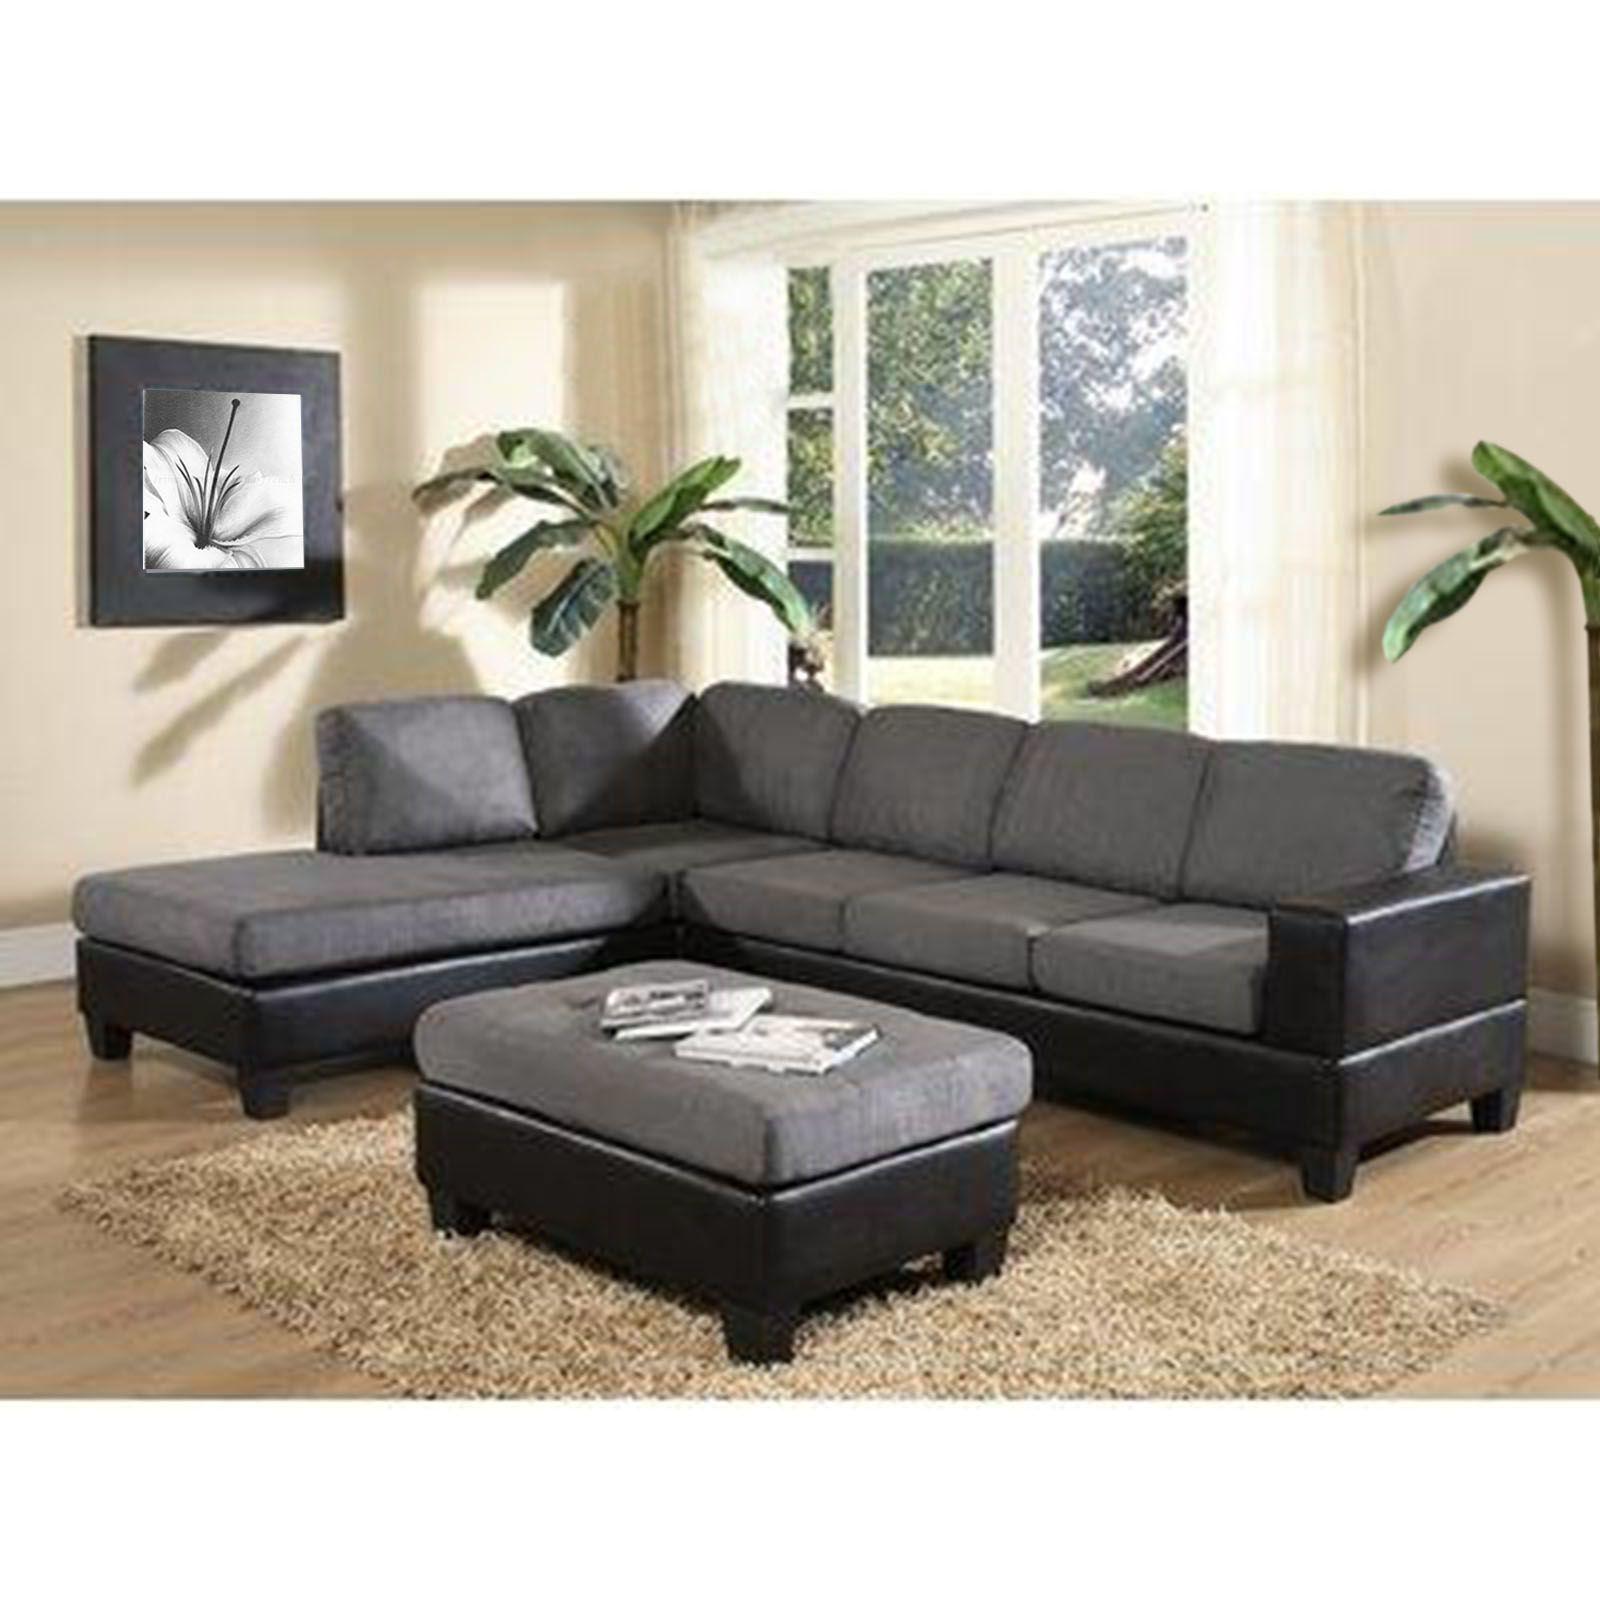 Venetian Worldwide Dallin Sectional Sofa Grey Ottoman $469 79